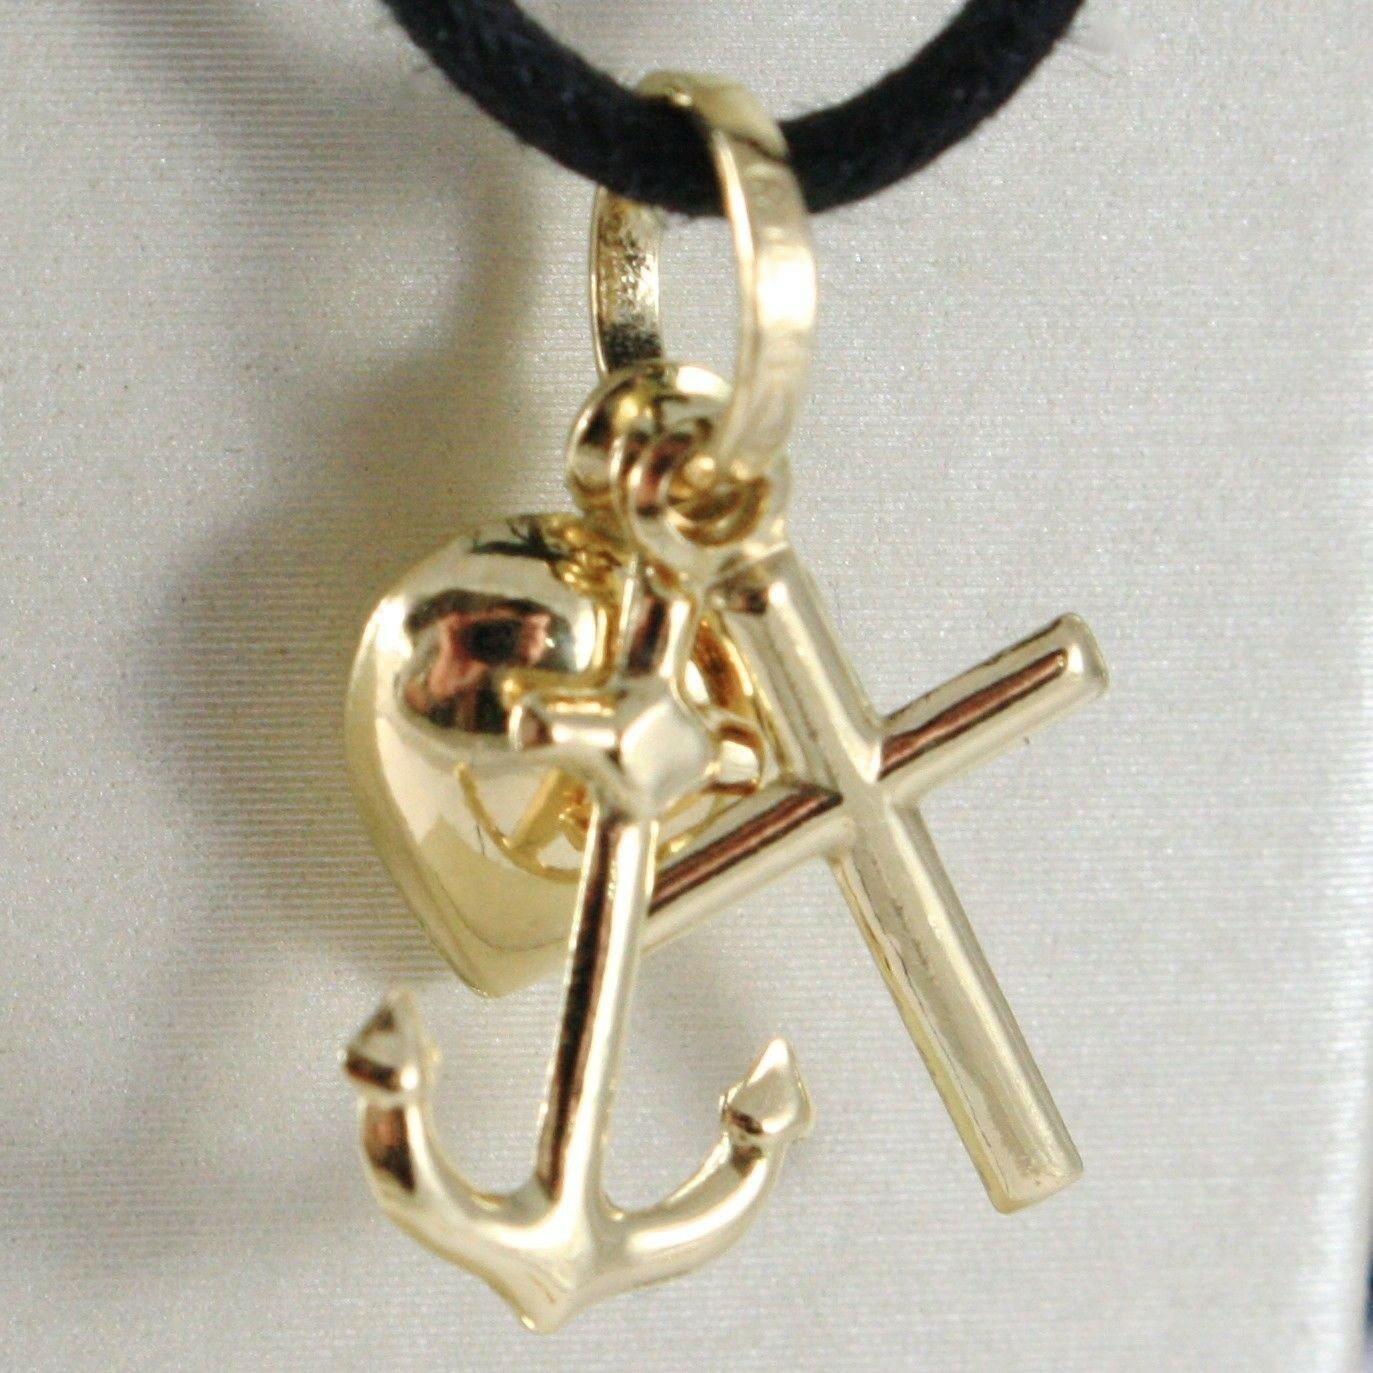 Yellow Gold Pendant Or White 18K, Faith Hope Charity, Cross, Heart, Anchor